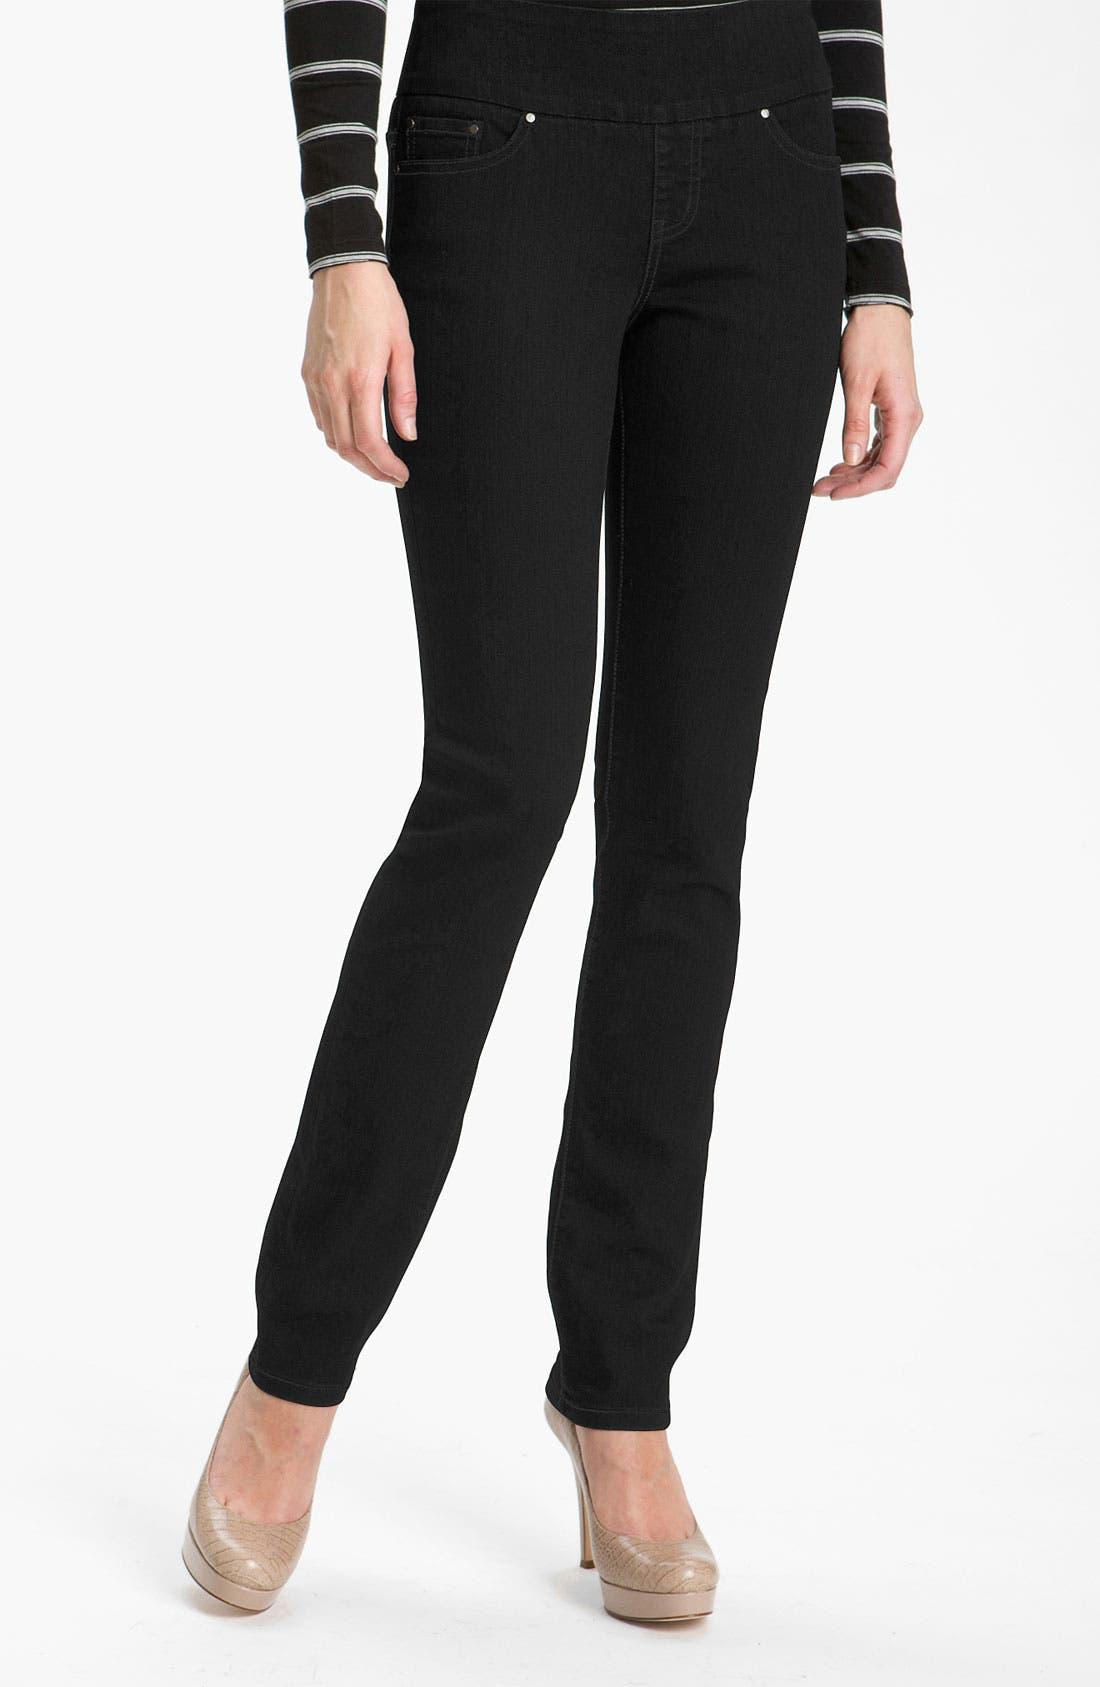 Alternate Image 1 Selected - Jag Jeans 'Malia' Slim Leg Stretch Jeans (Petite)